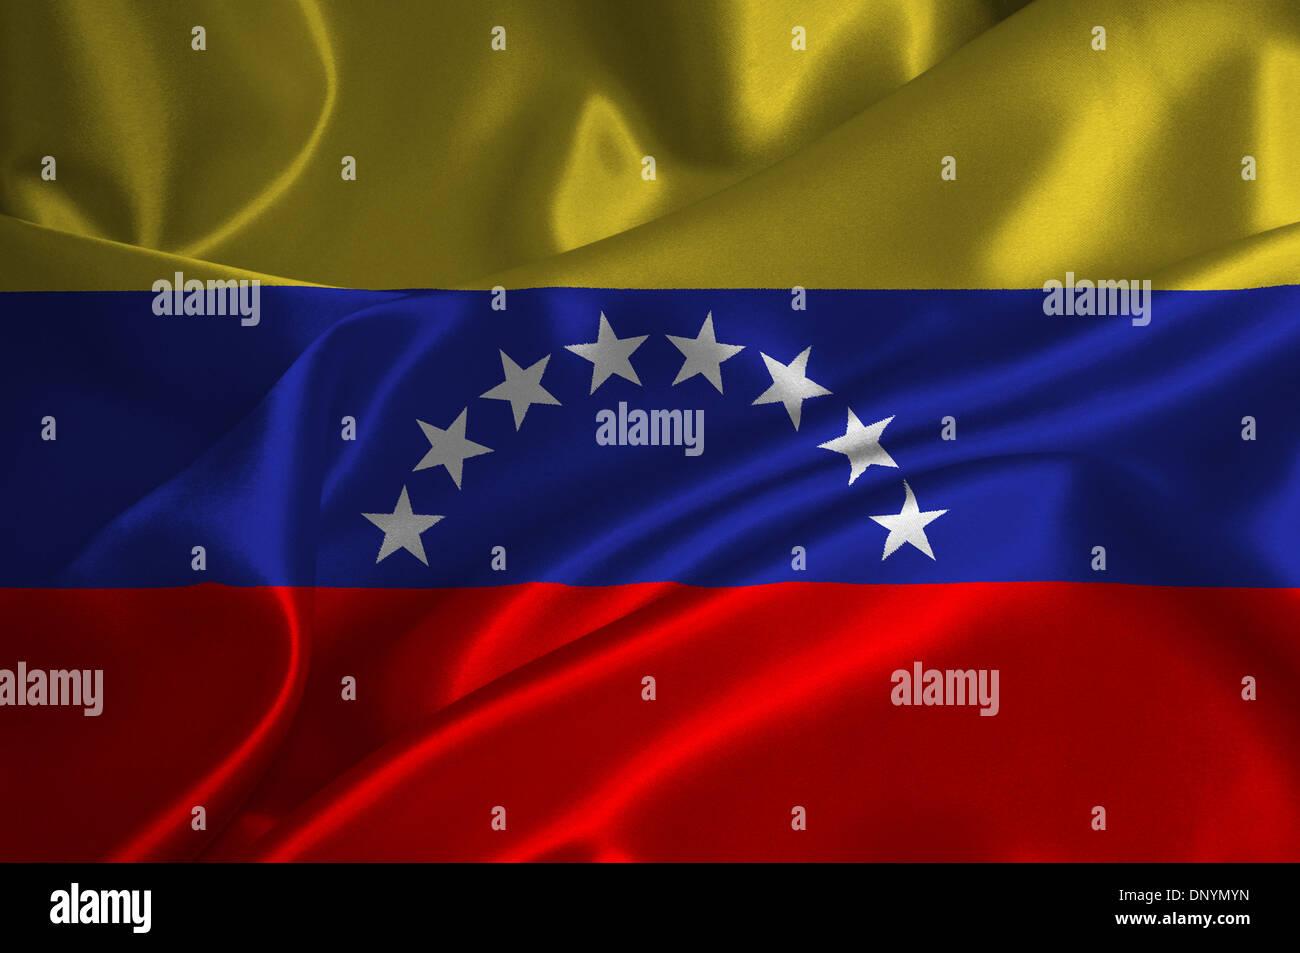 Venezuela flag on satin texture. - Stock Image